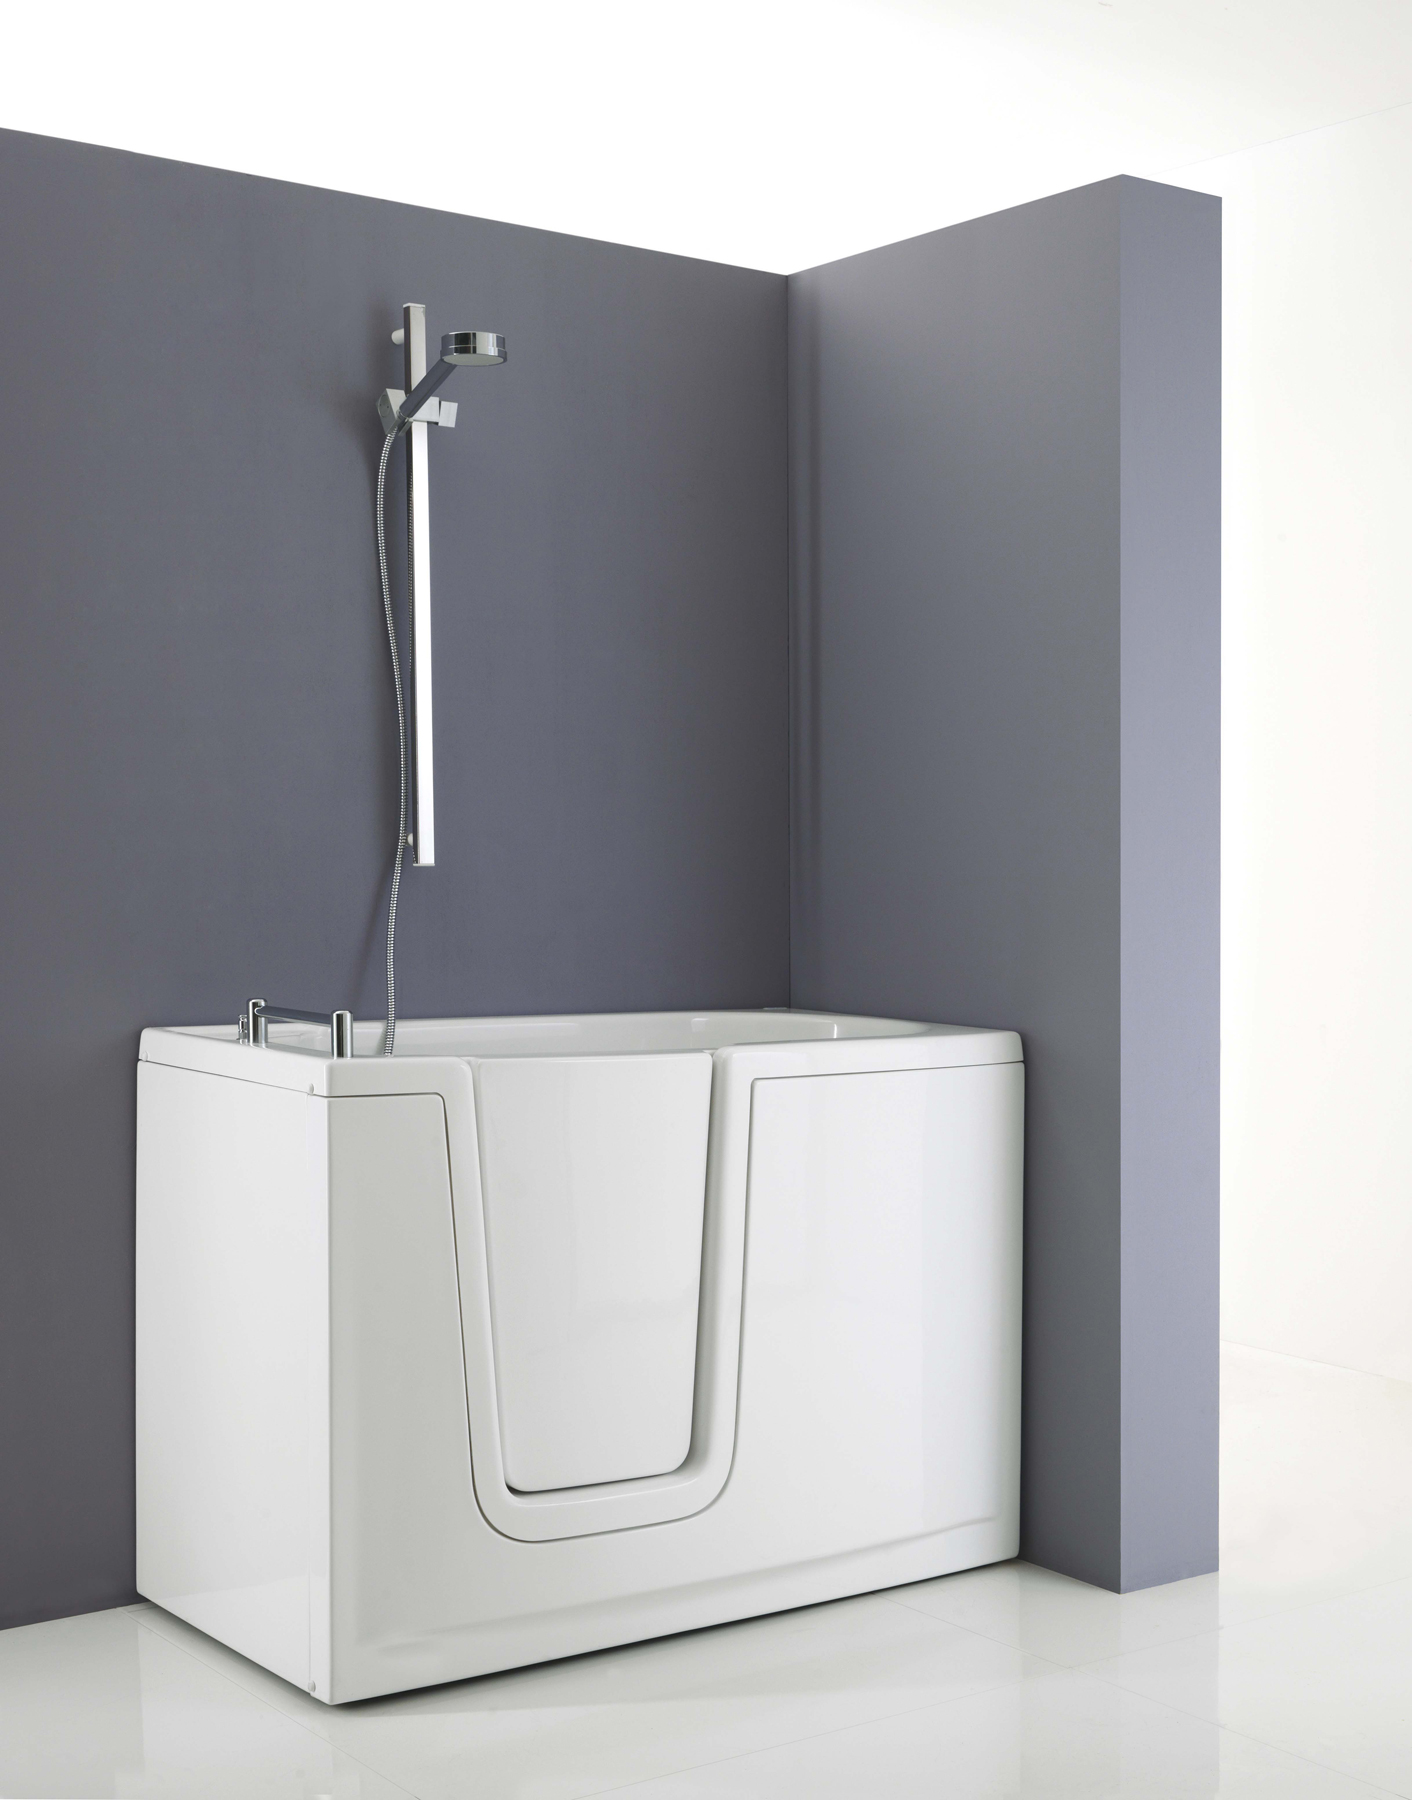 Walk-in bathtub with inwards opening door for disabled bathroom